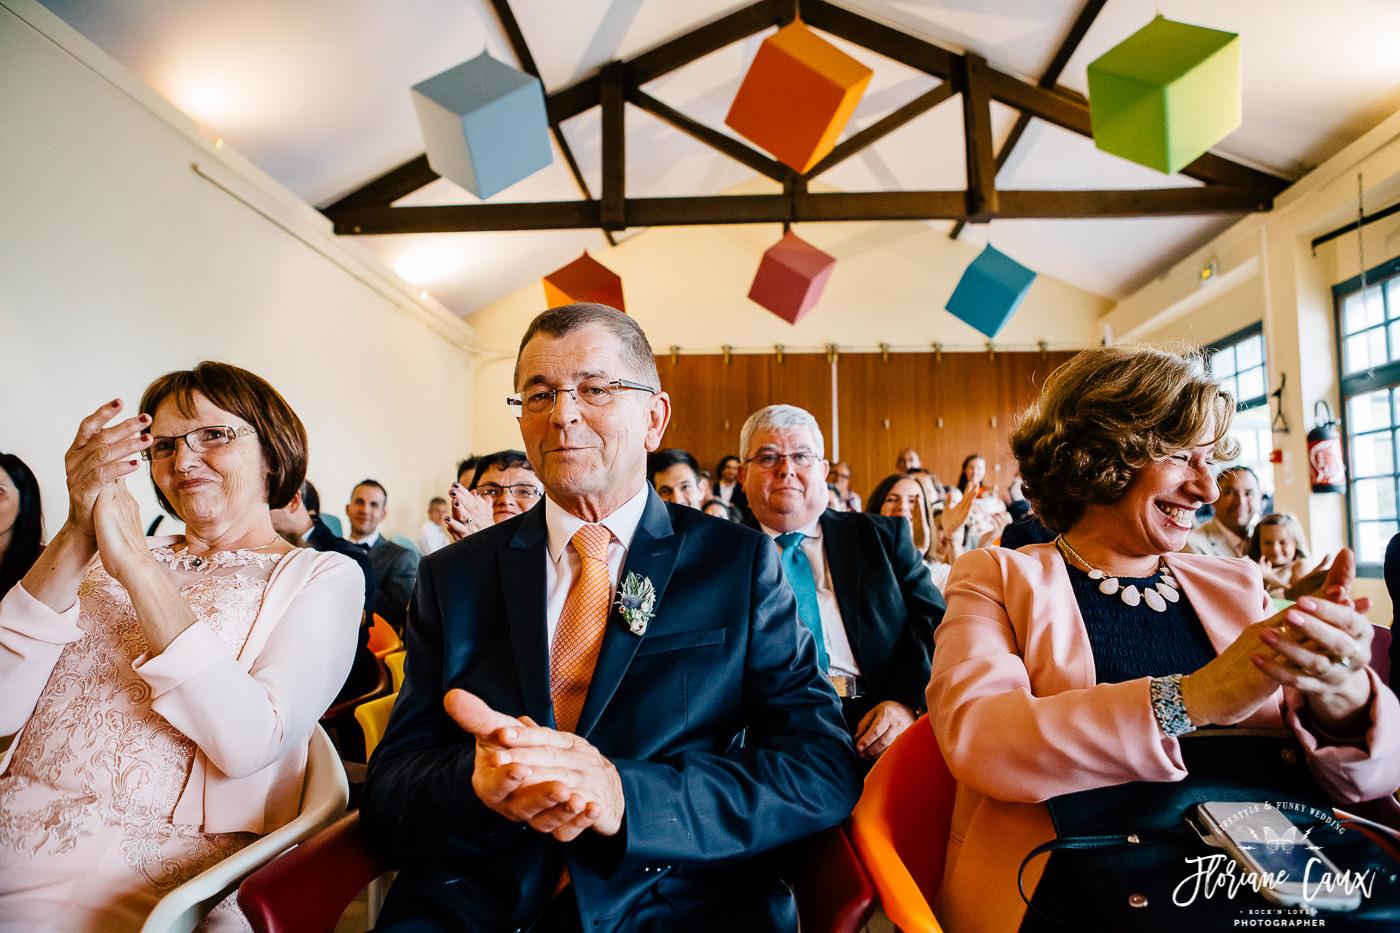 photographe-mariage-pays-basque-Floriane-Caux (19)